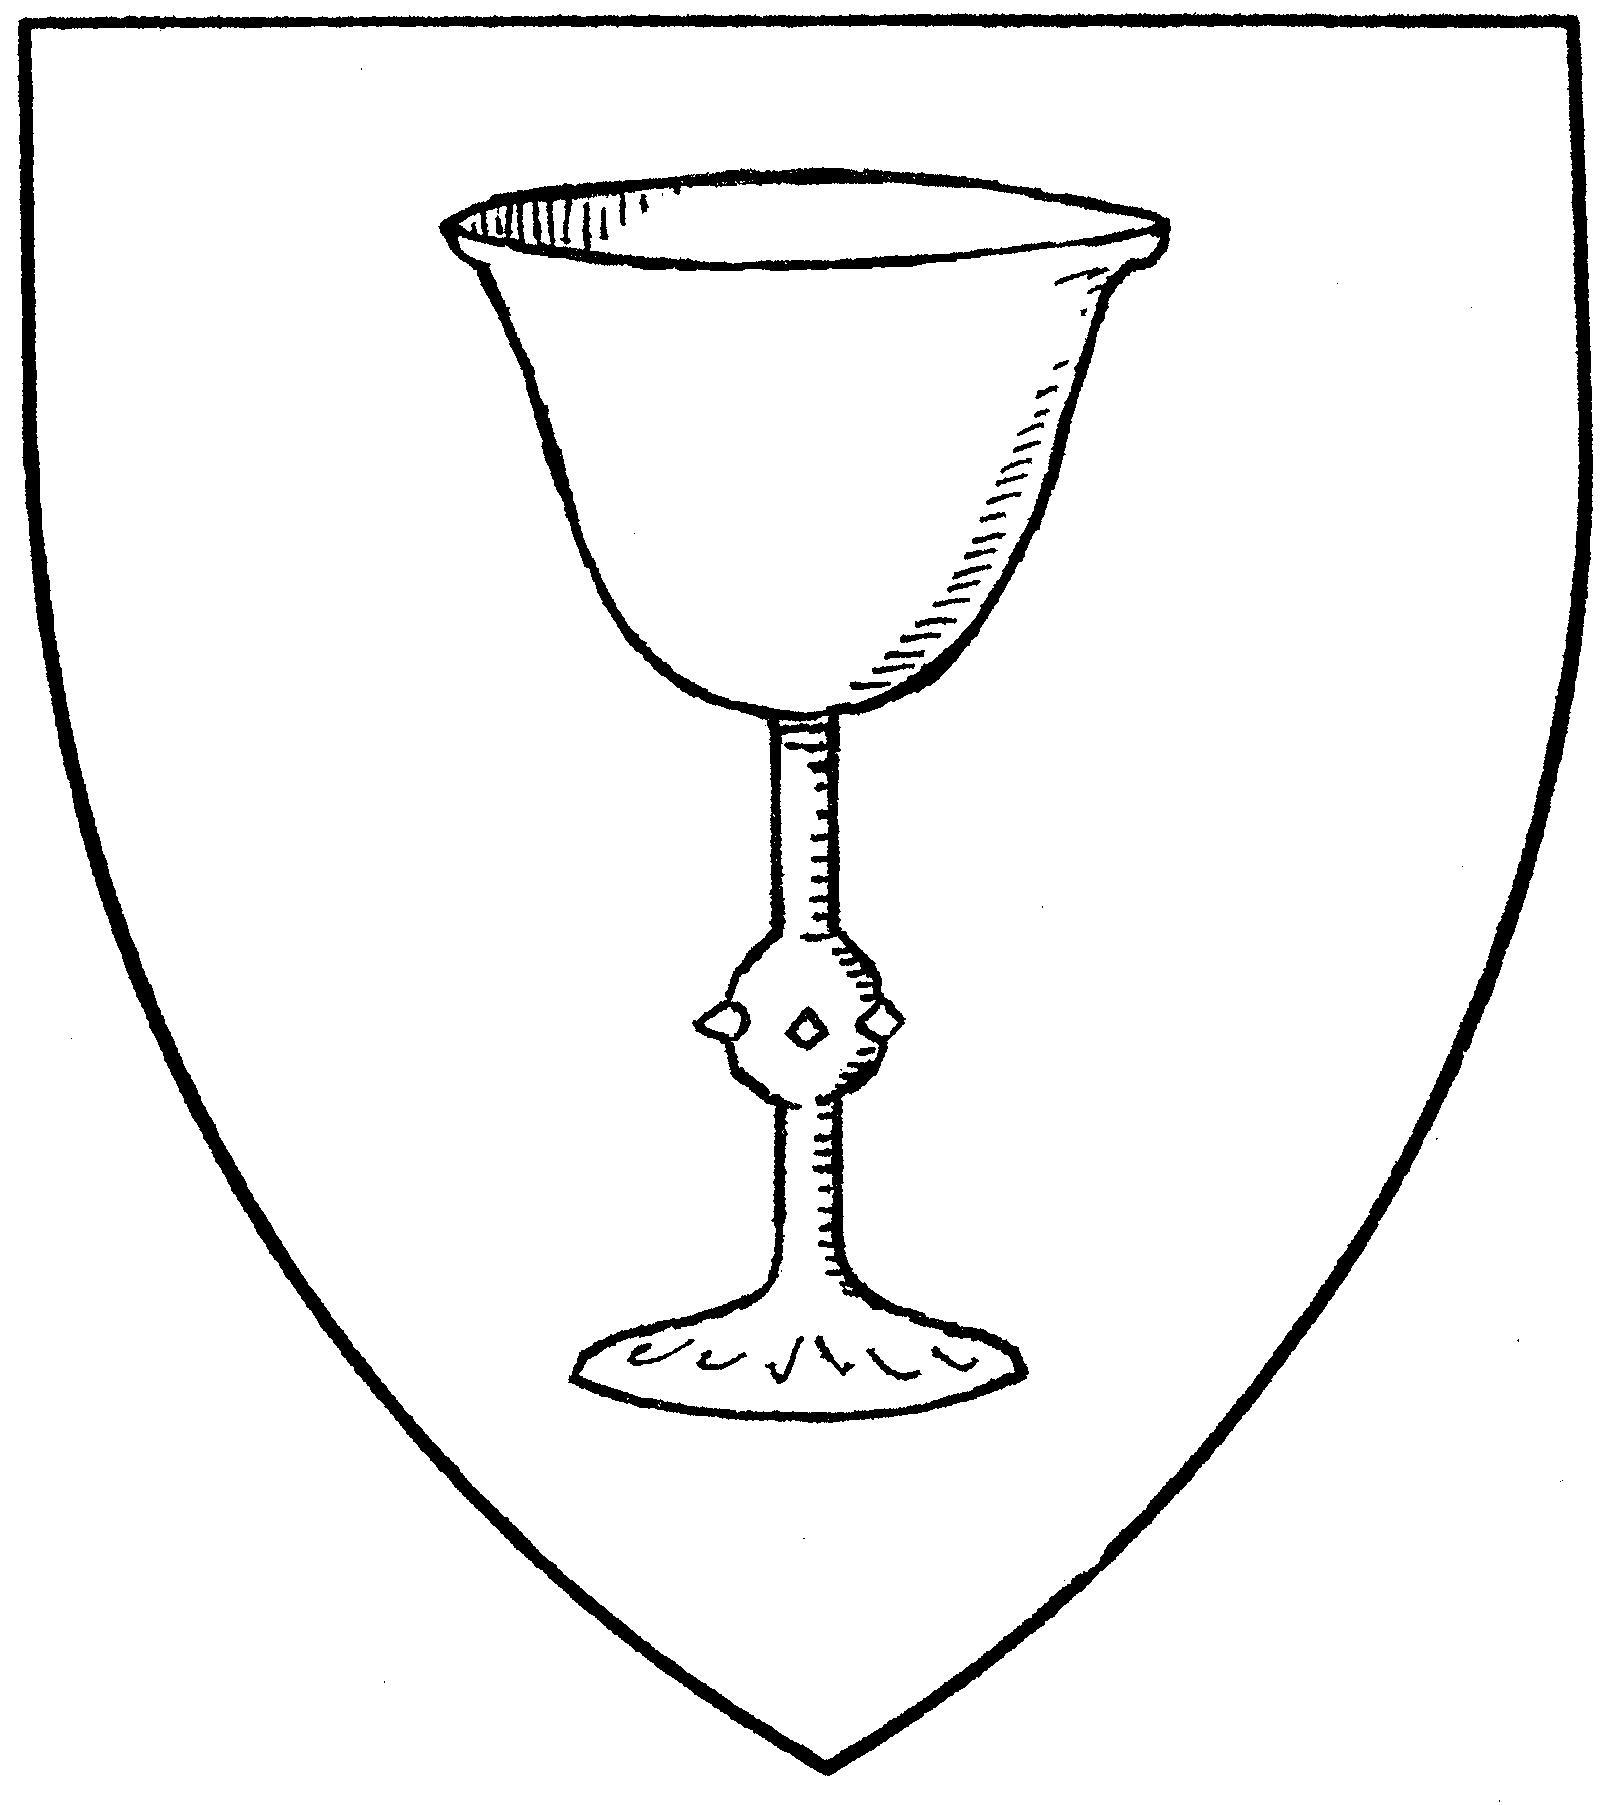 1611x1805 Cup Beaker Mistholme